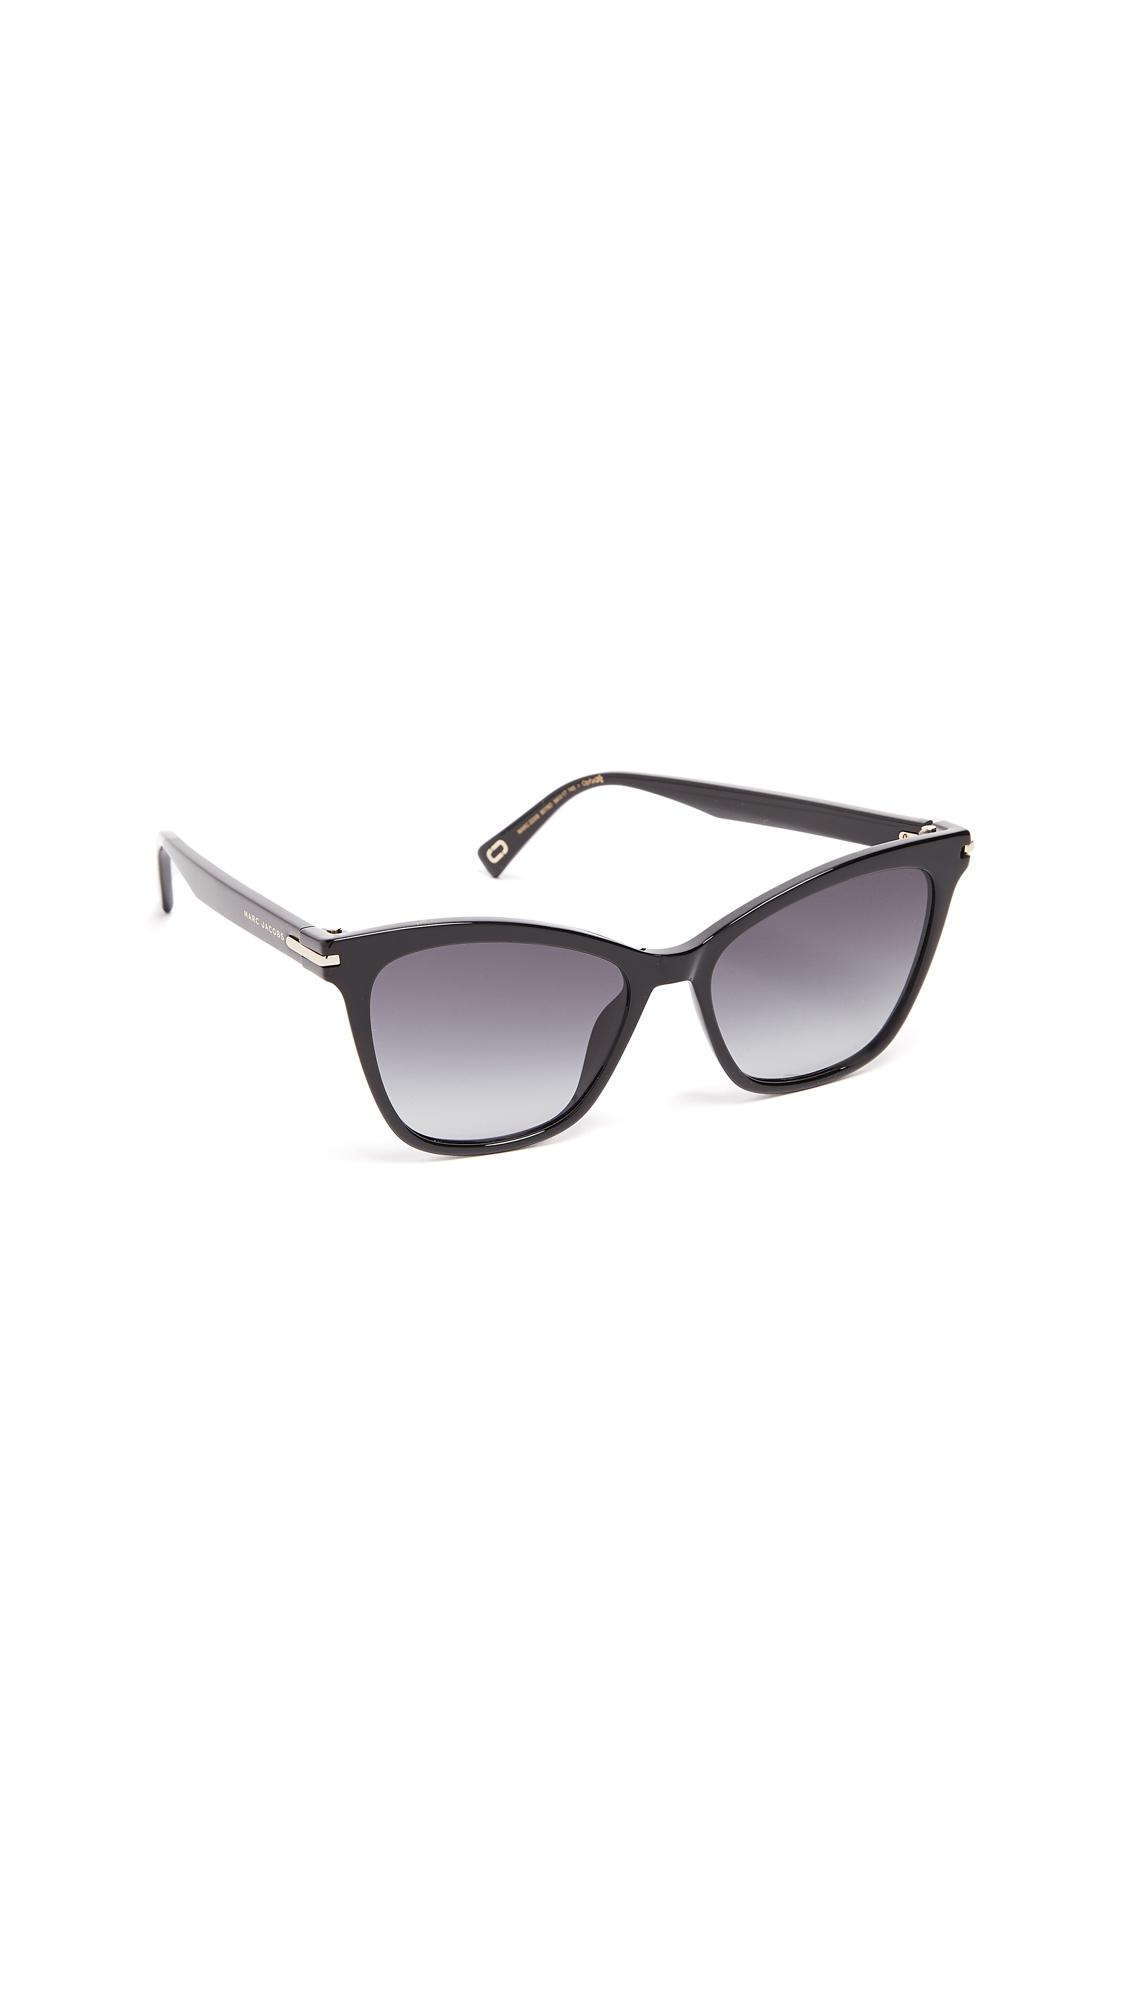 Marc Jacobs Cat Eye Sunglasses in Grey